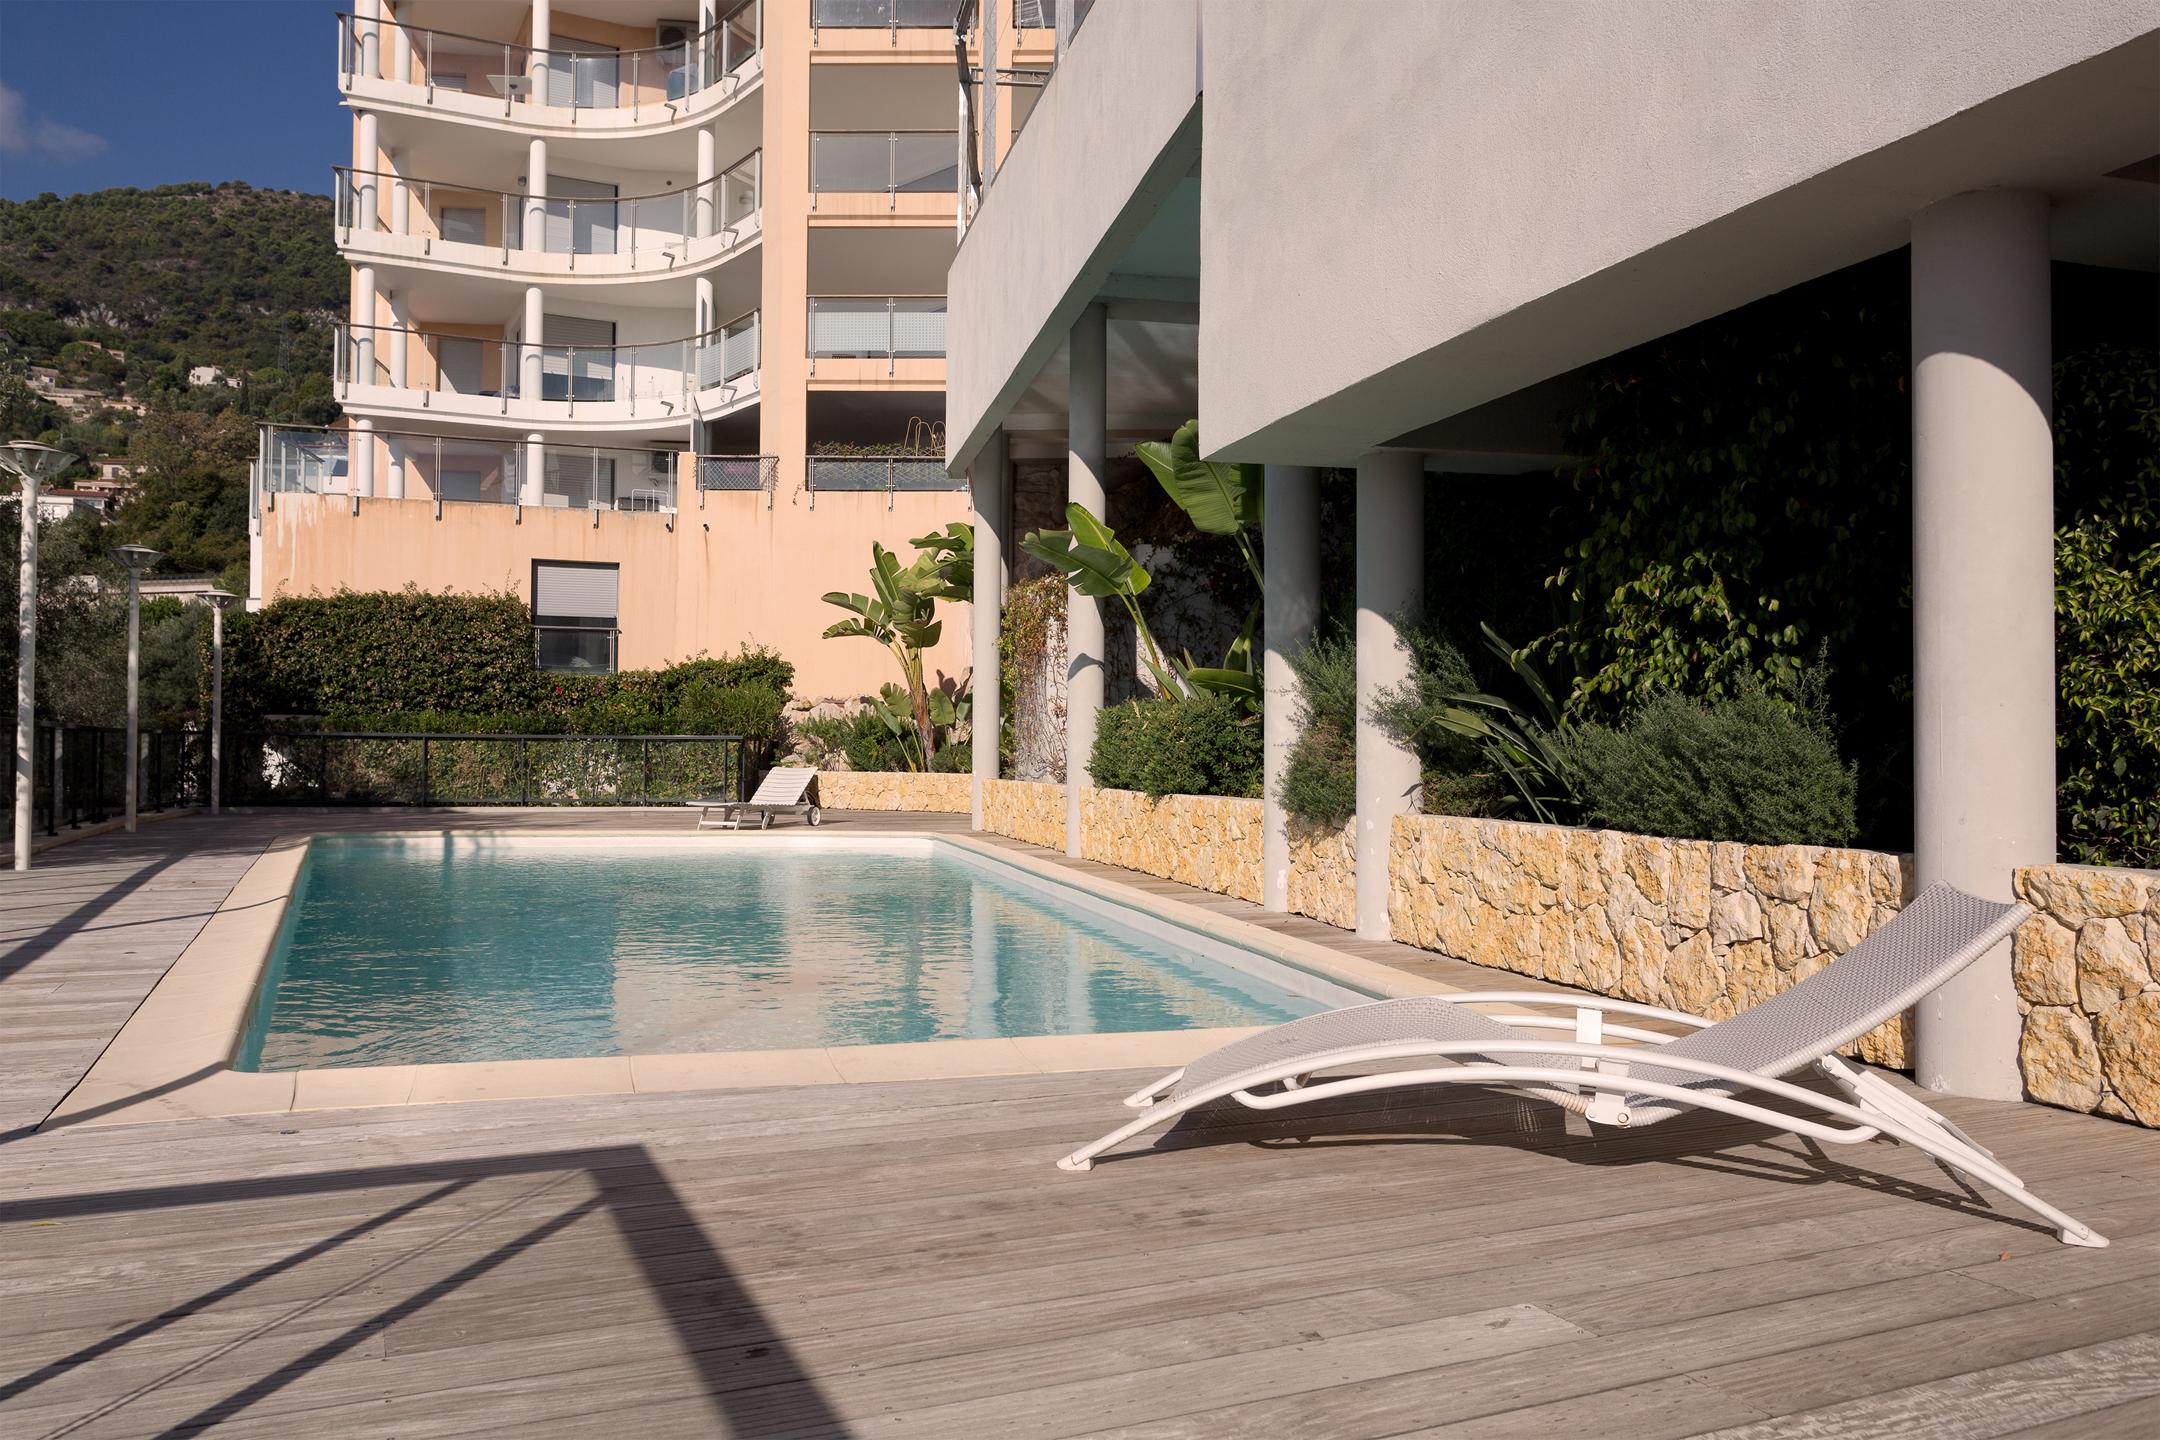 Le Monachetto: 2 bedroom apartment in Monaco with pool